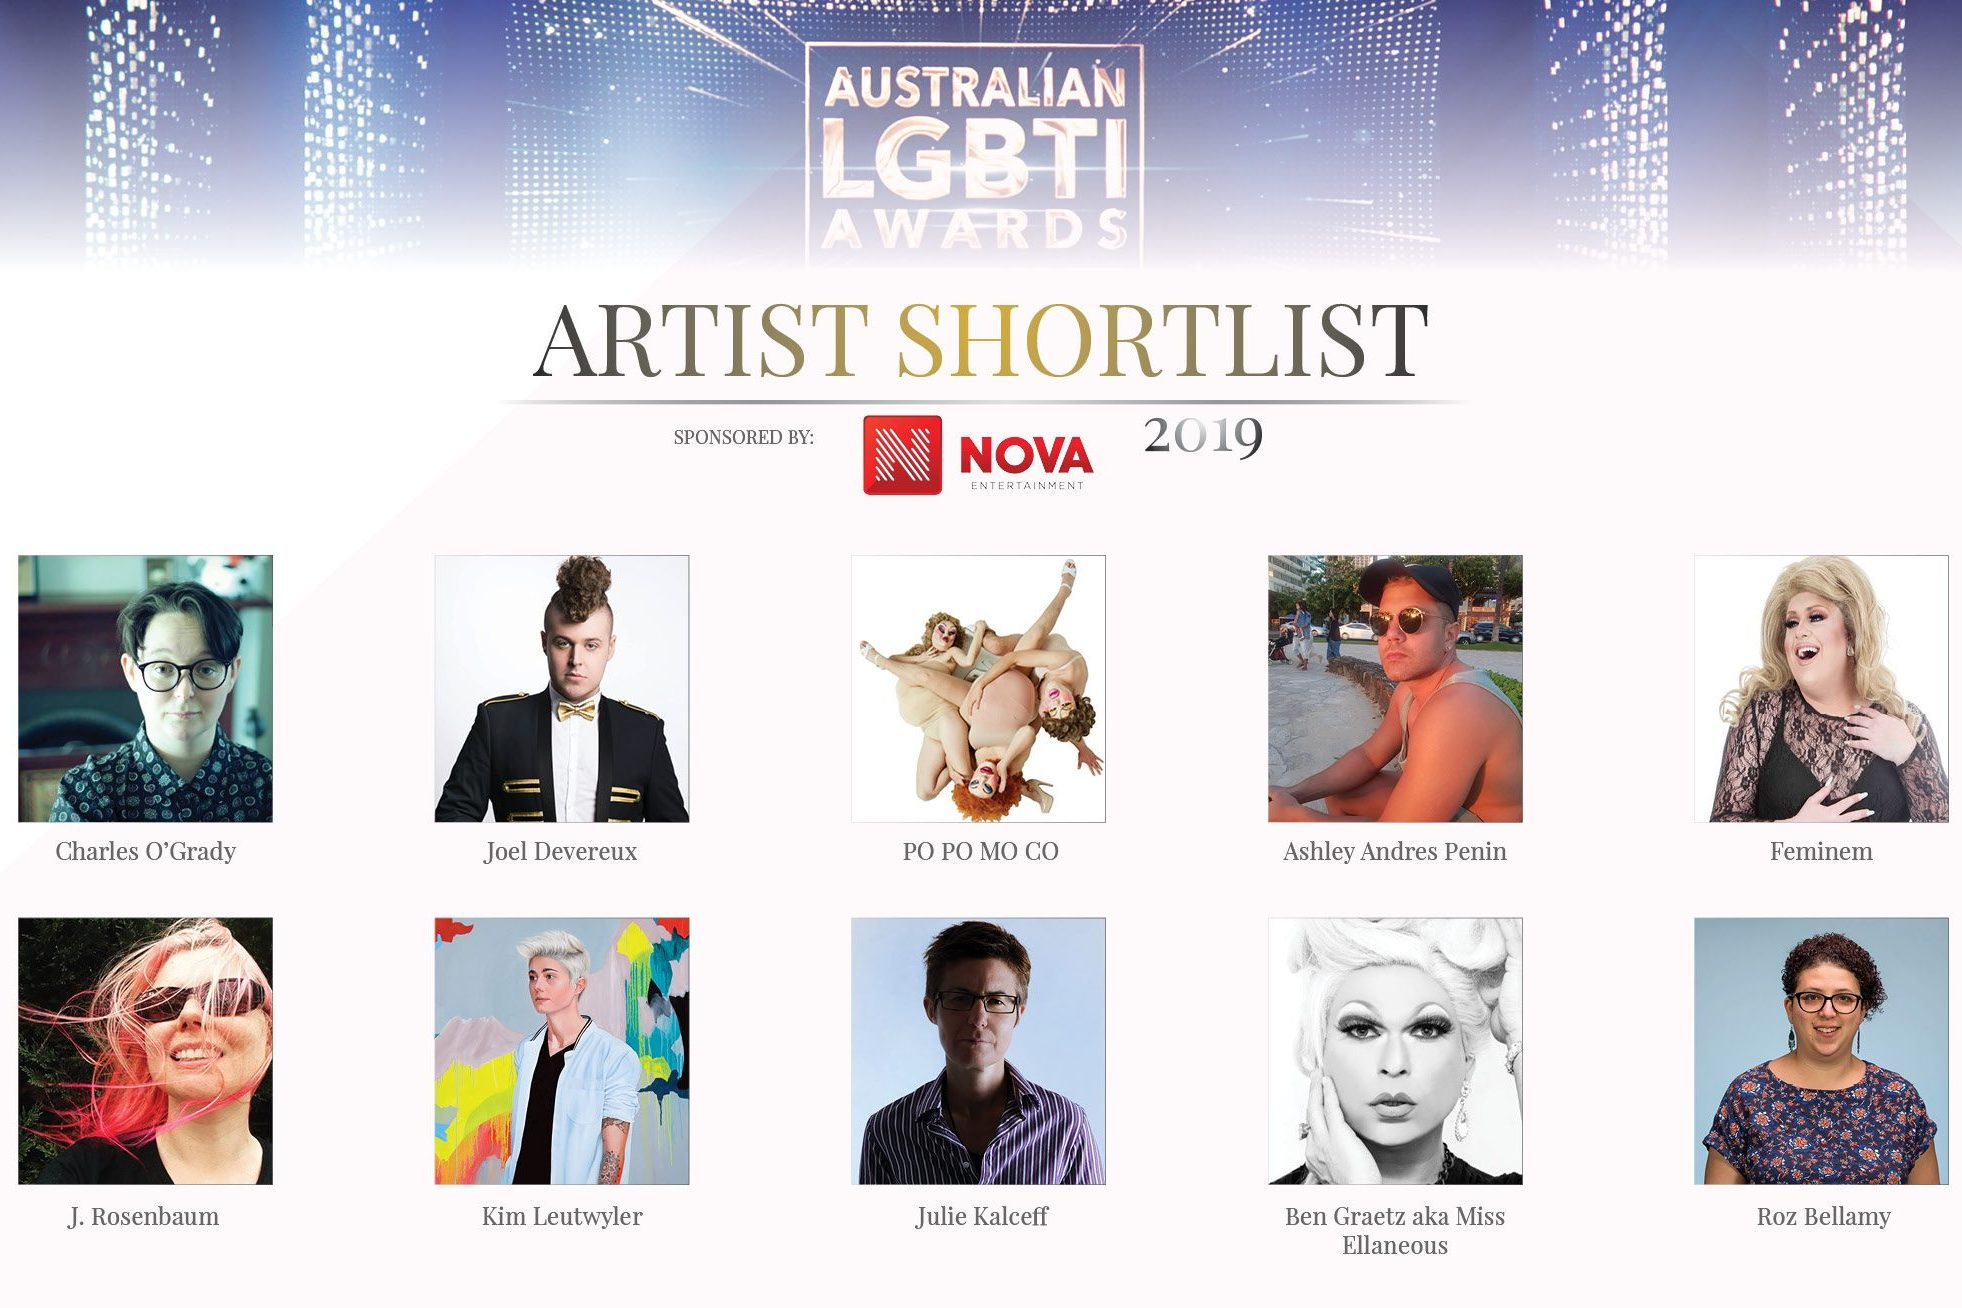 Australia-LGBTI-Awards-Announce-2019-Shortlist-lotl